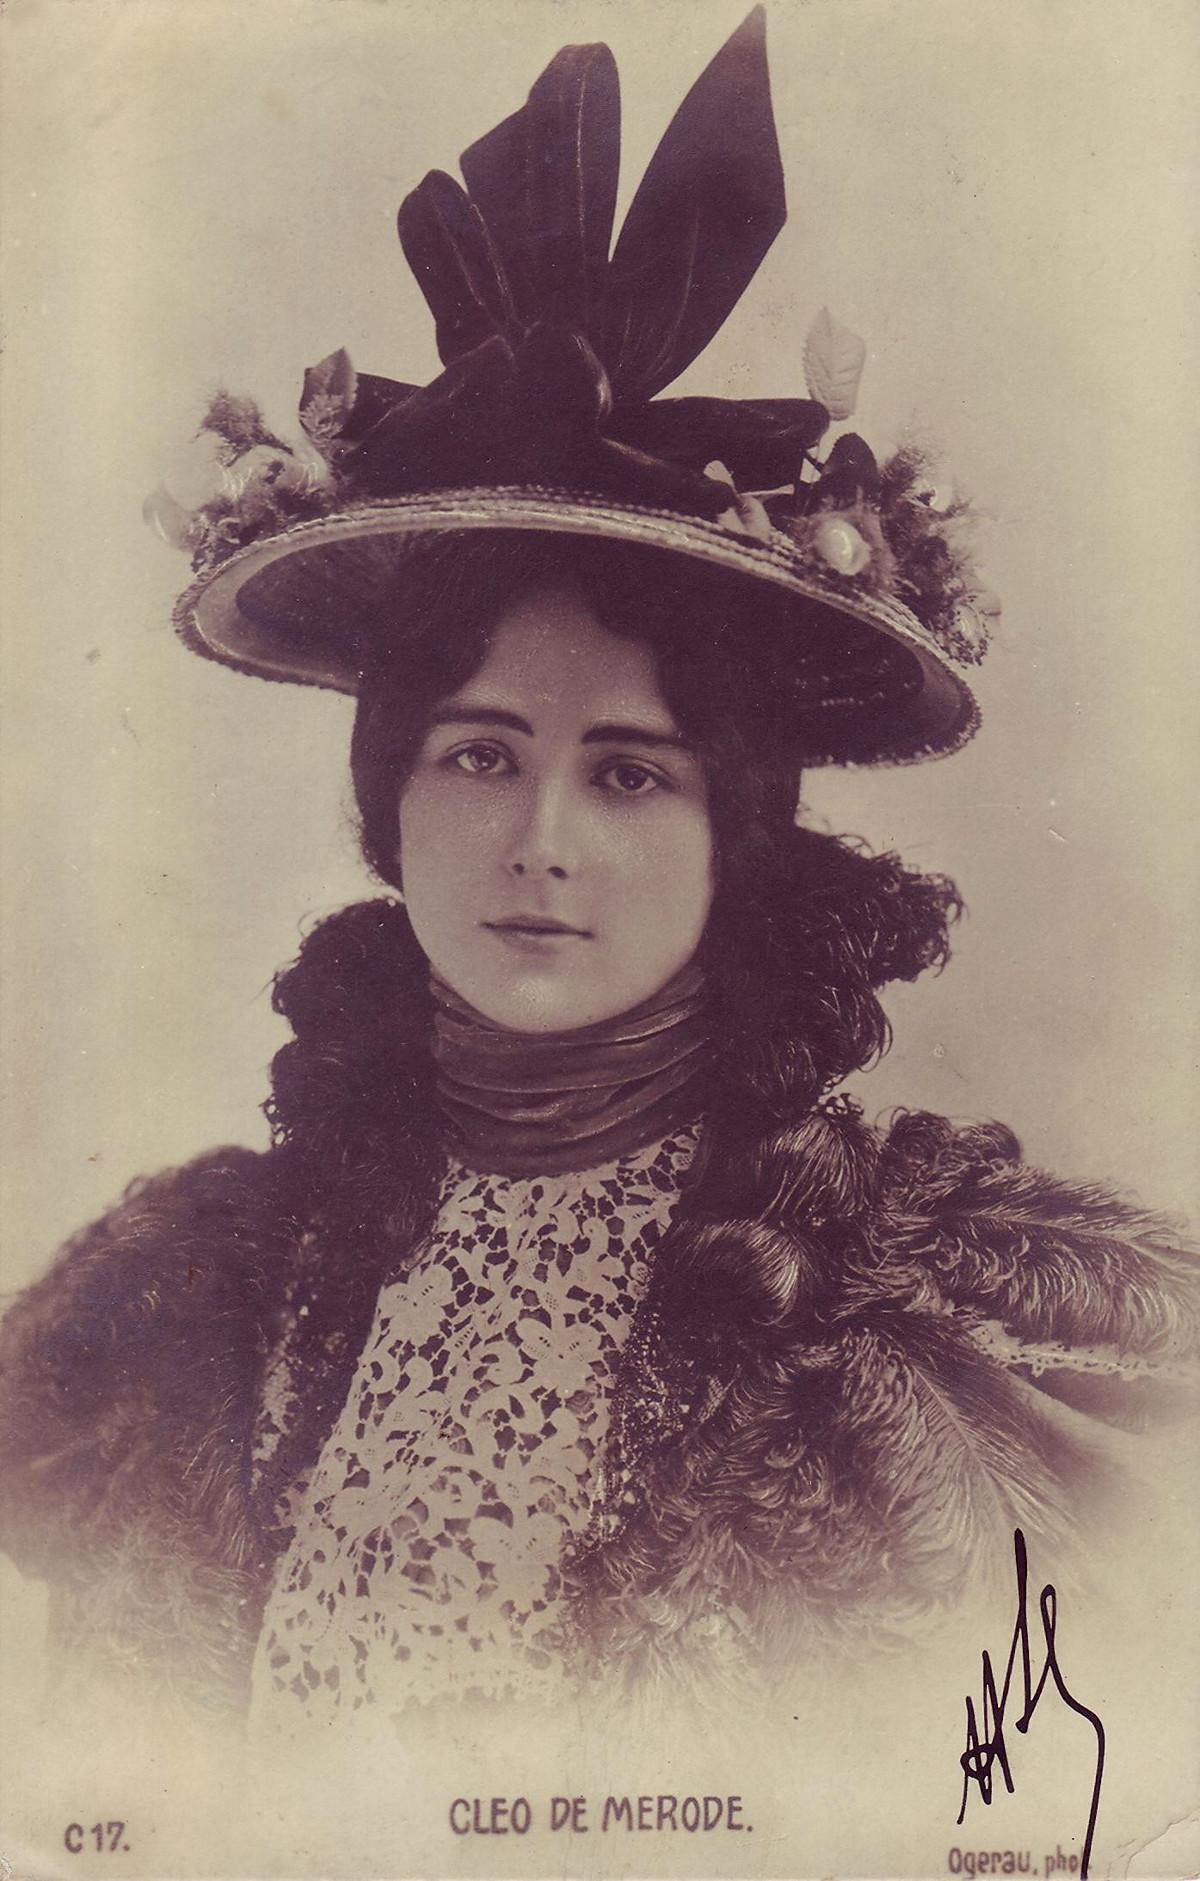 Cléo de Merode, by Charles Ogerau, 1902